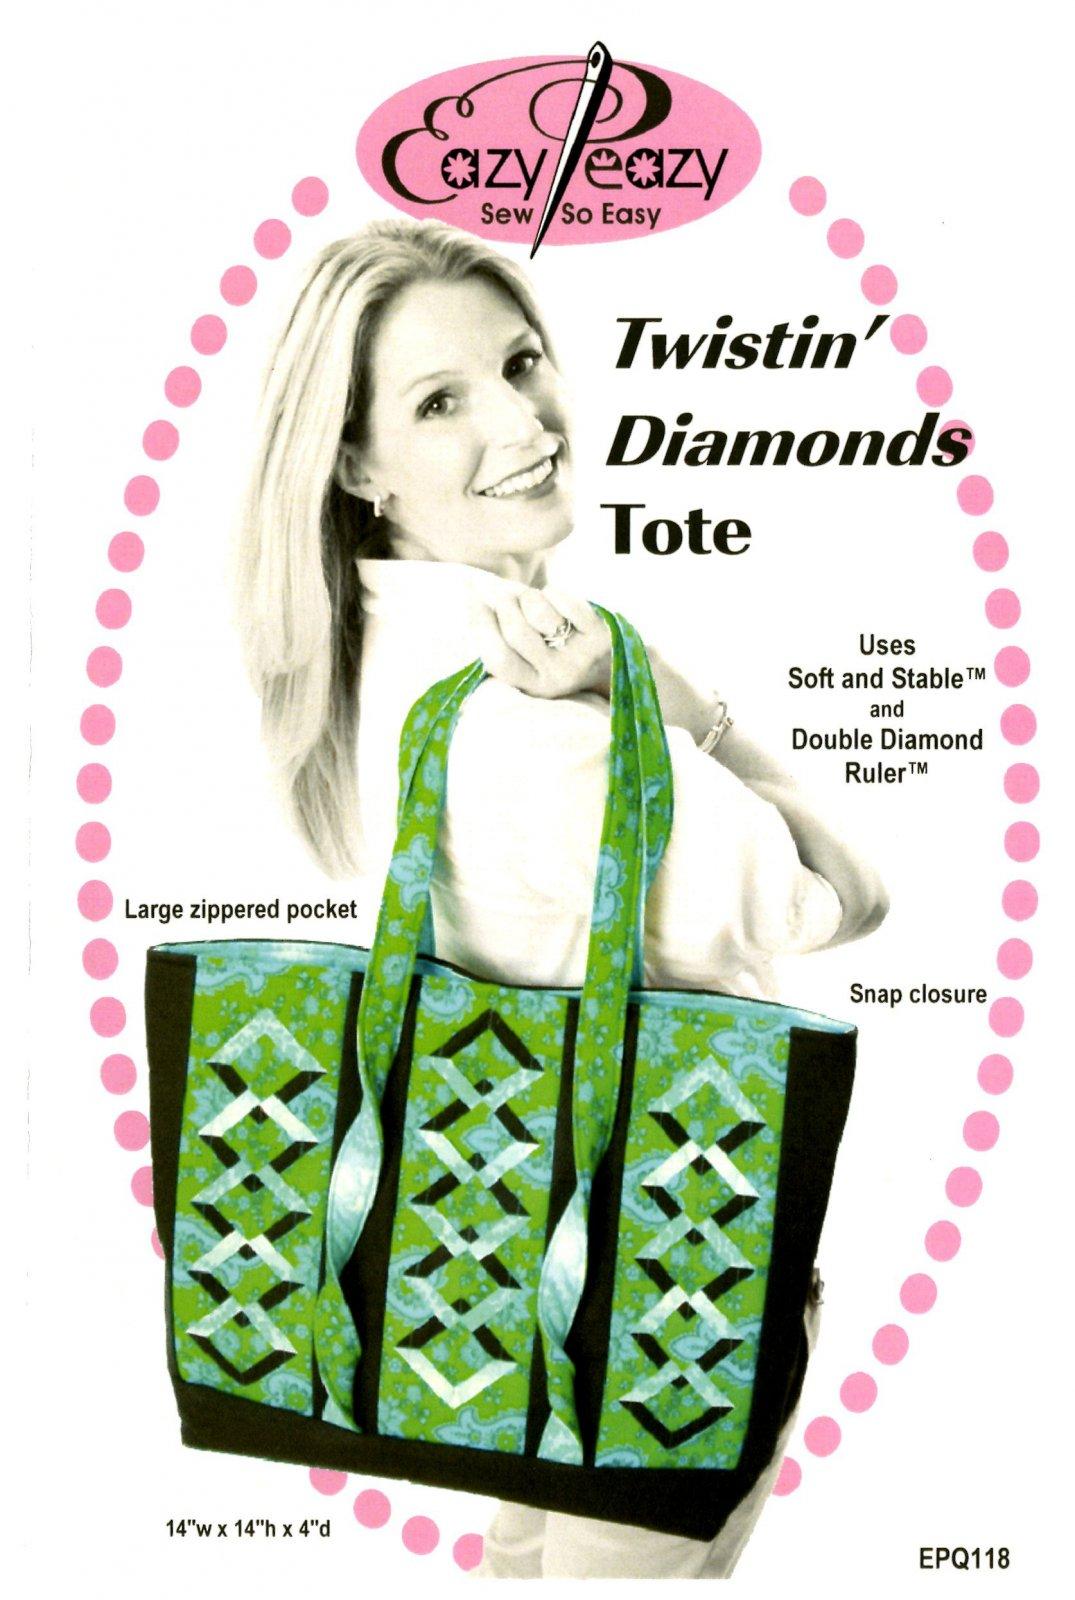 Twistin' Diamonds Tote